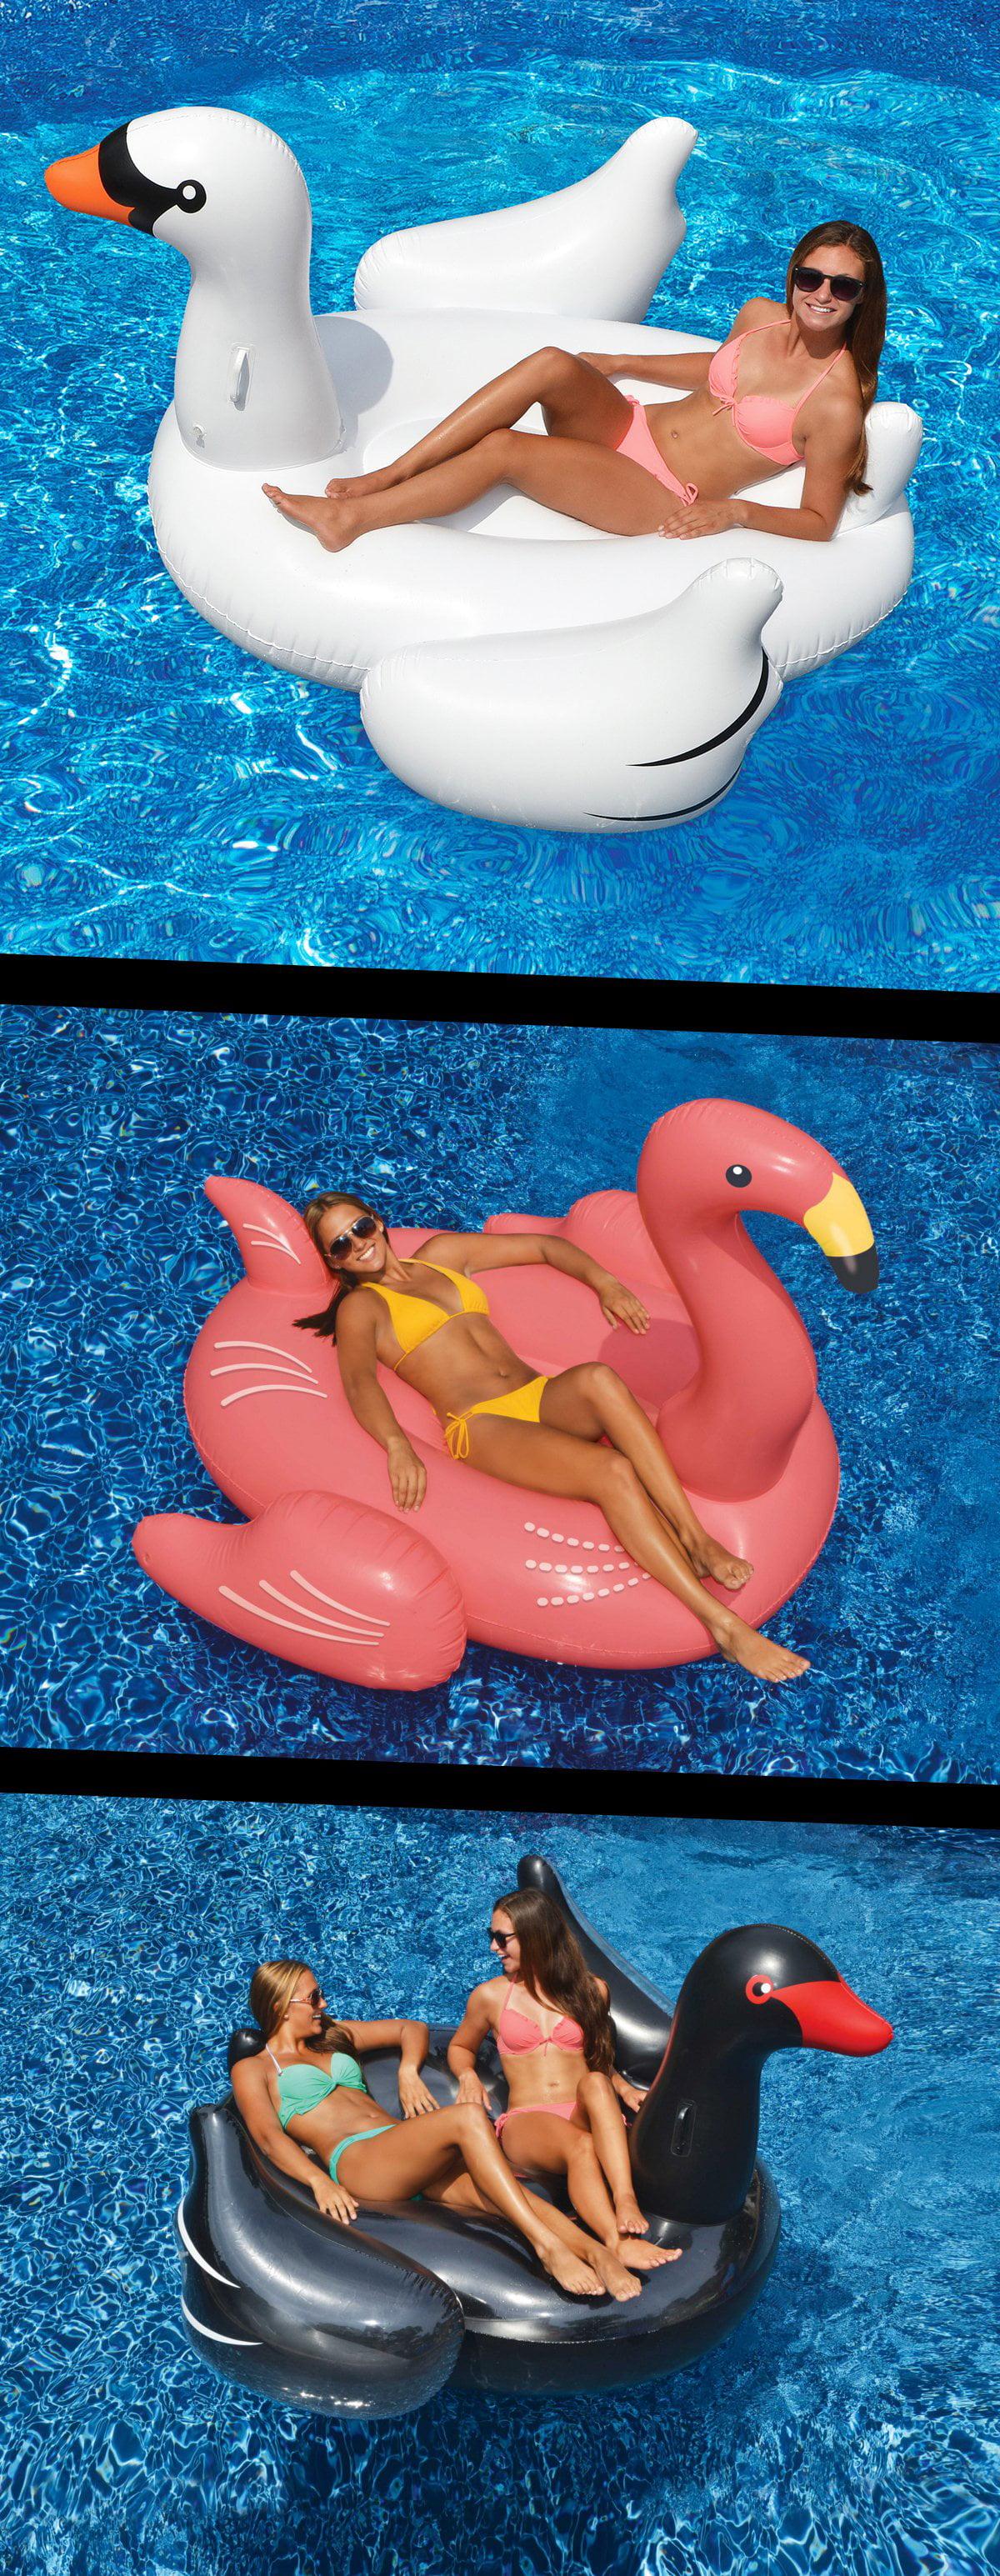 Swimline Swimming Pool Giant Rideable Float Set, White Black Swans + Flamingo by Swimline Corp